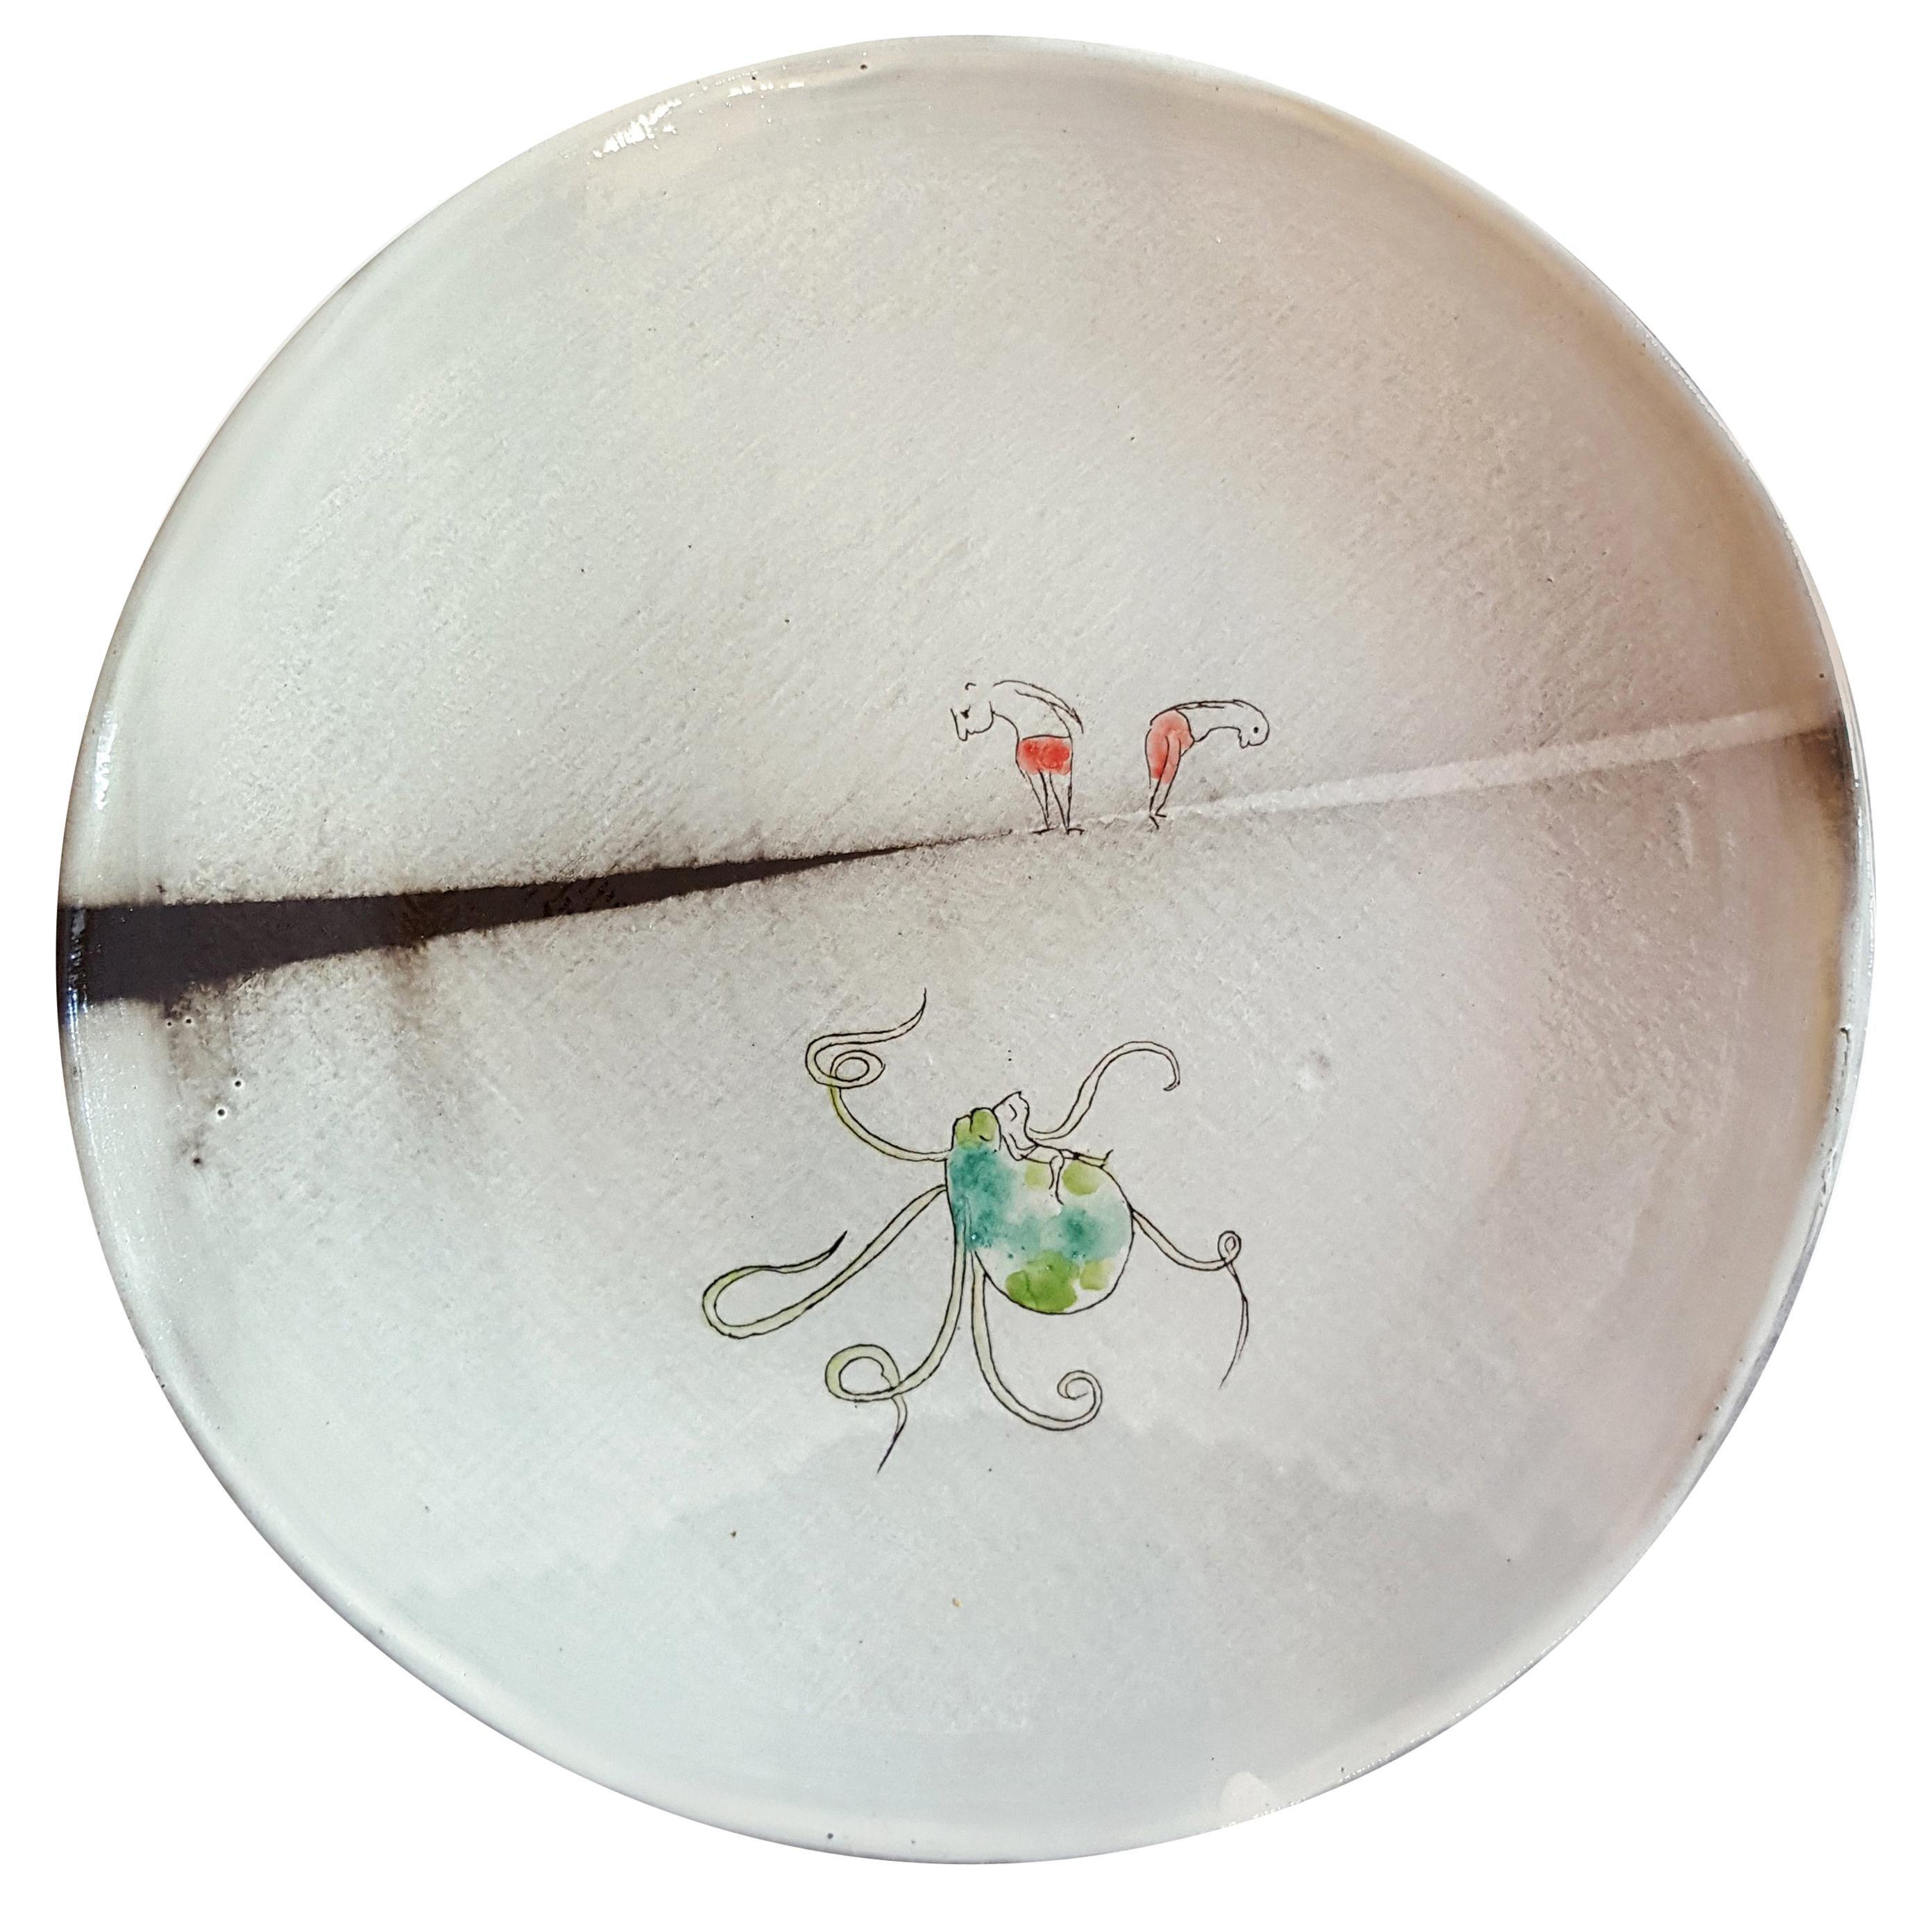 Unique French Artist's Ceramic Dinner Plates